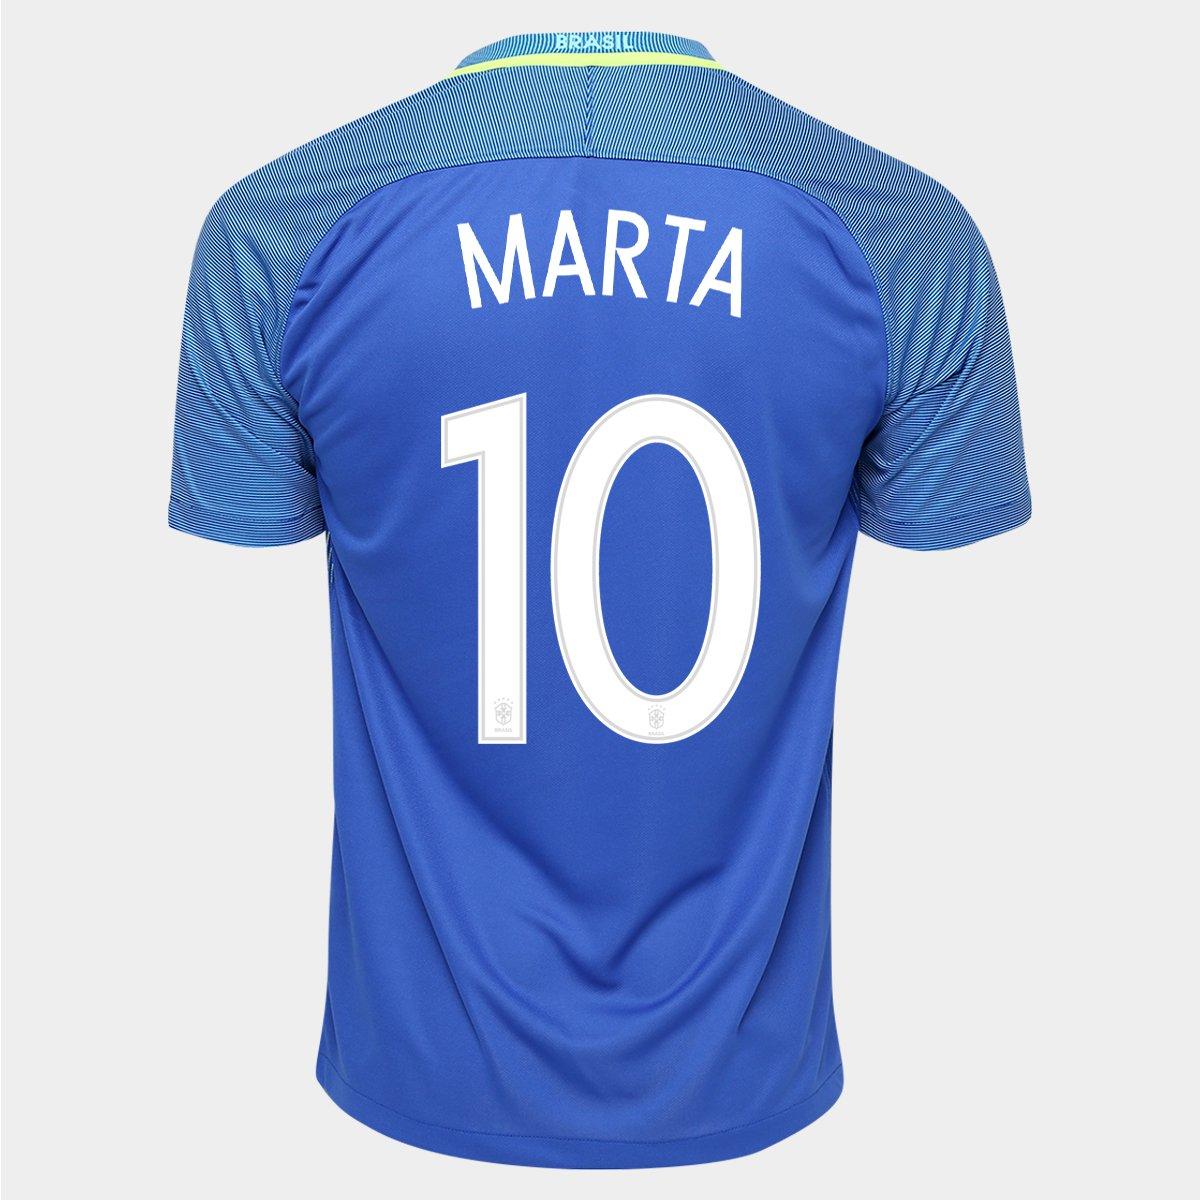 78399567ee687 Camisa Nike Seleção Brasil II 2016 nº 10 - Marta - Compre Agora ...